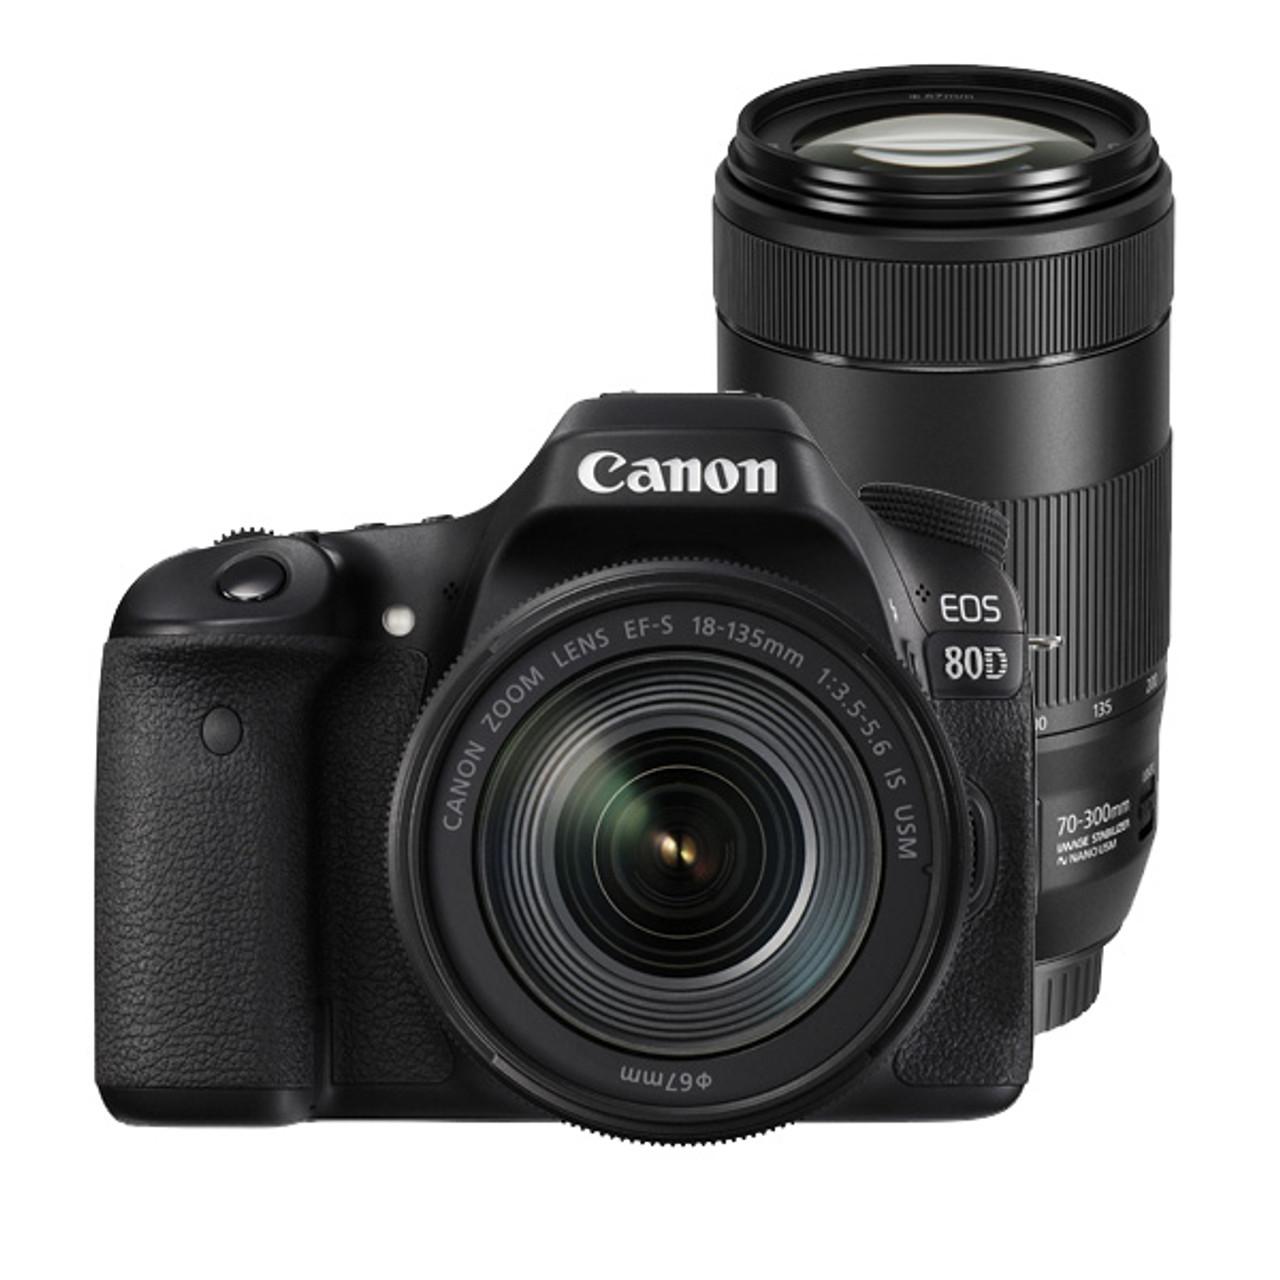 Canon EOS 80D 18-135mm f.5-5.6 IS USM & Canon EF 70-300mm F4-5.6 IS II USM